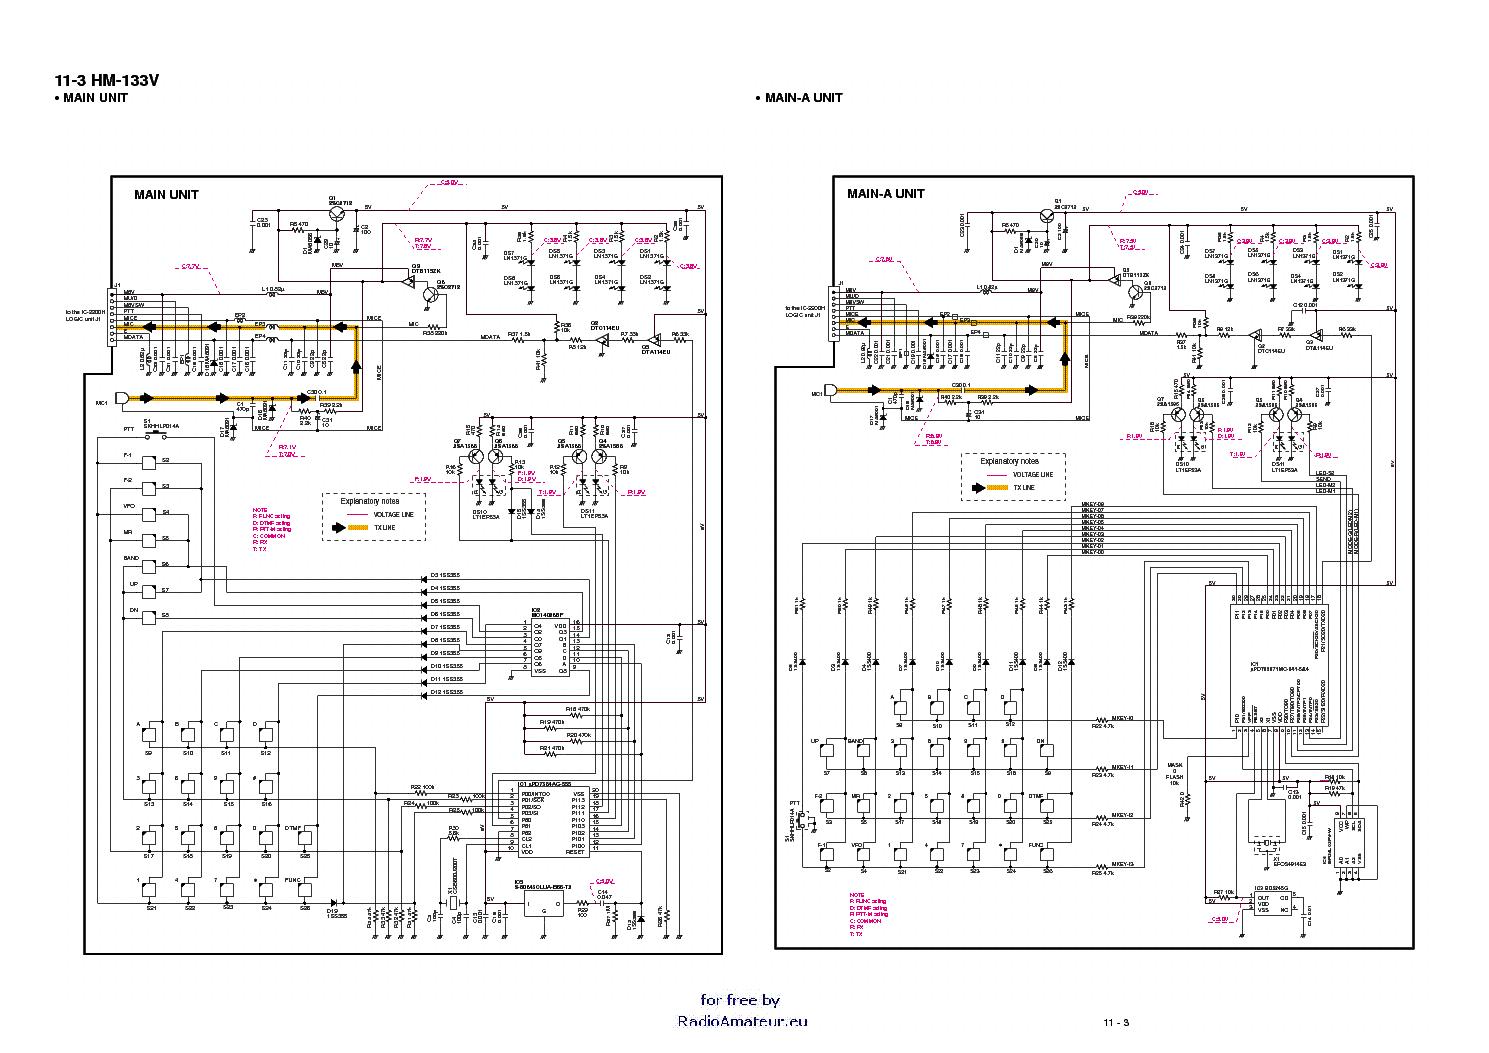 ICOM HM-133 SM Service Manual download, schematics, eeprom ... on